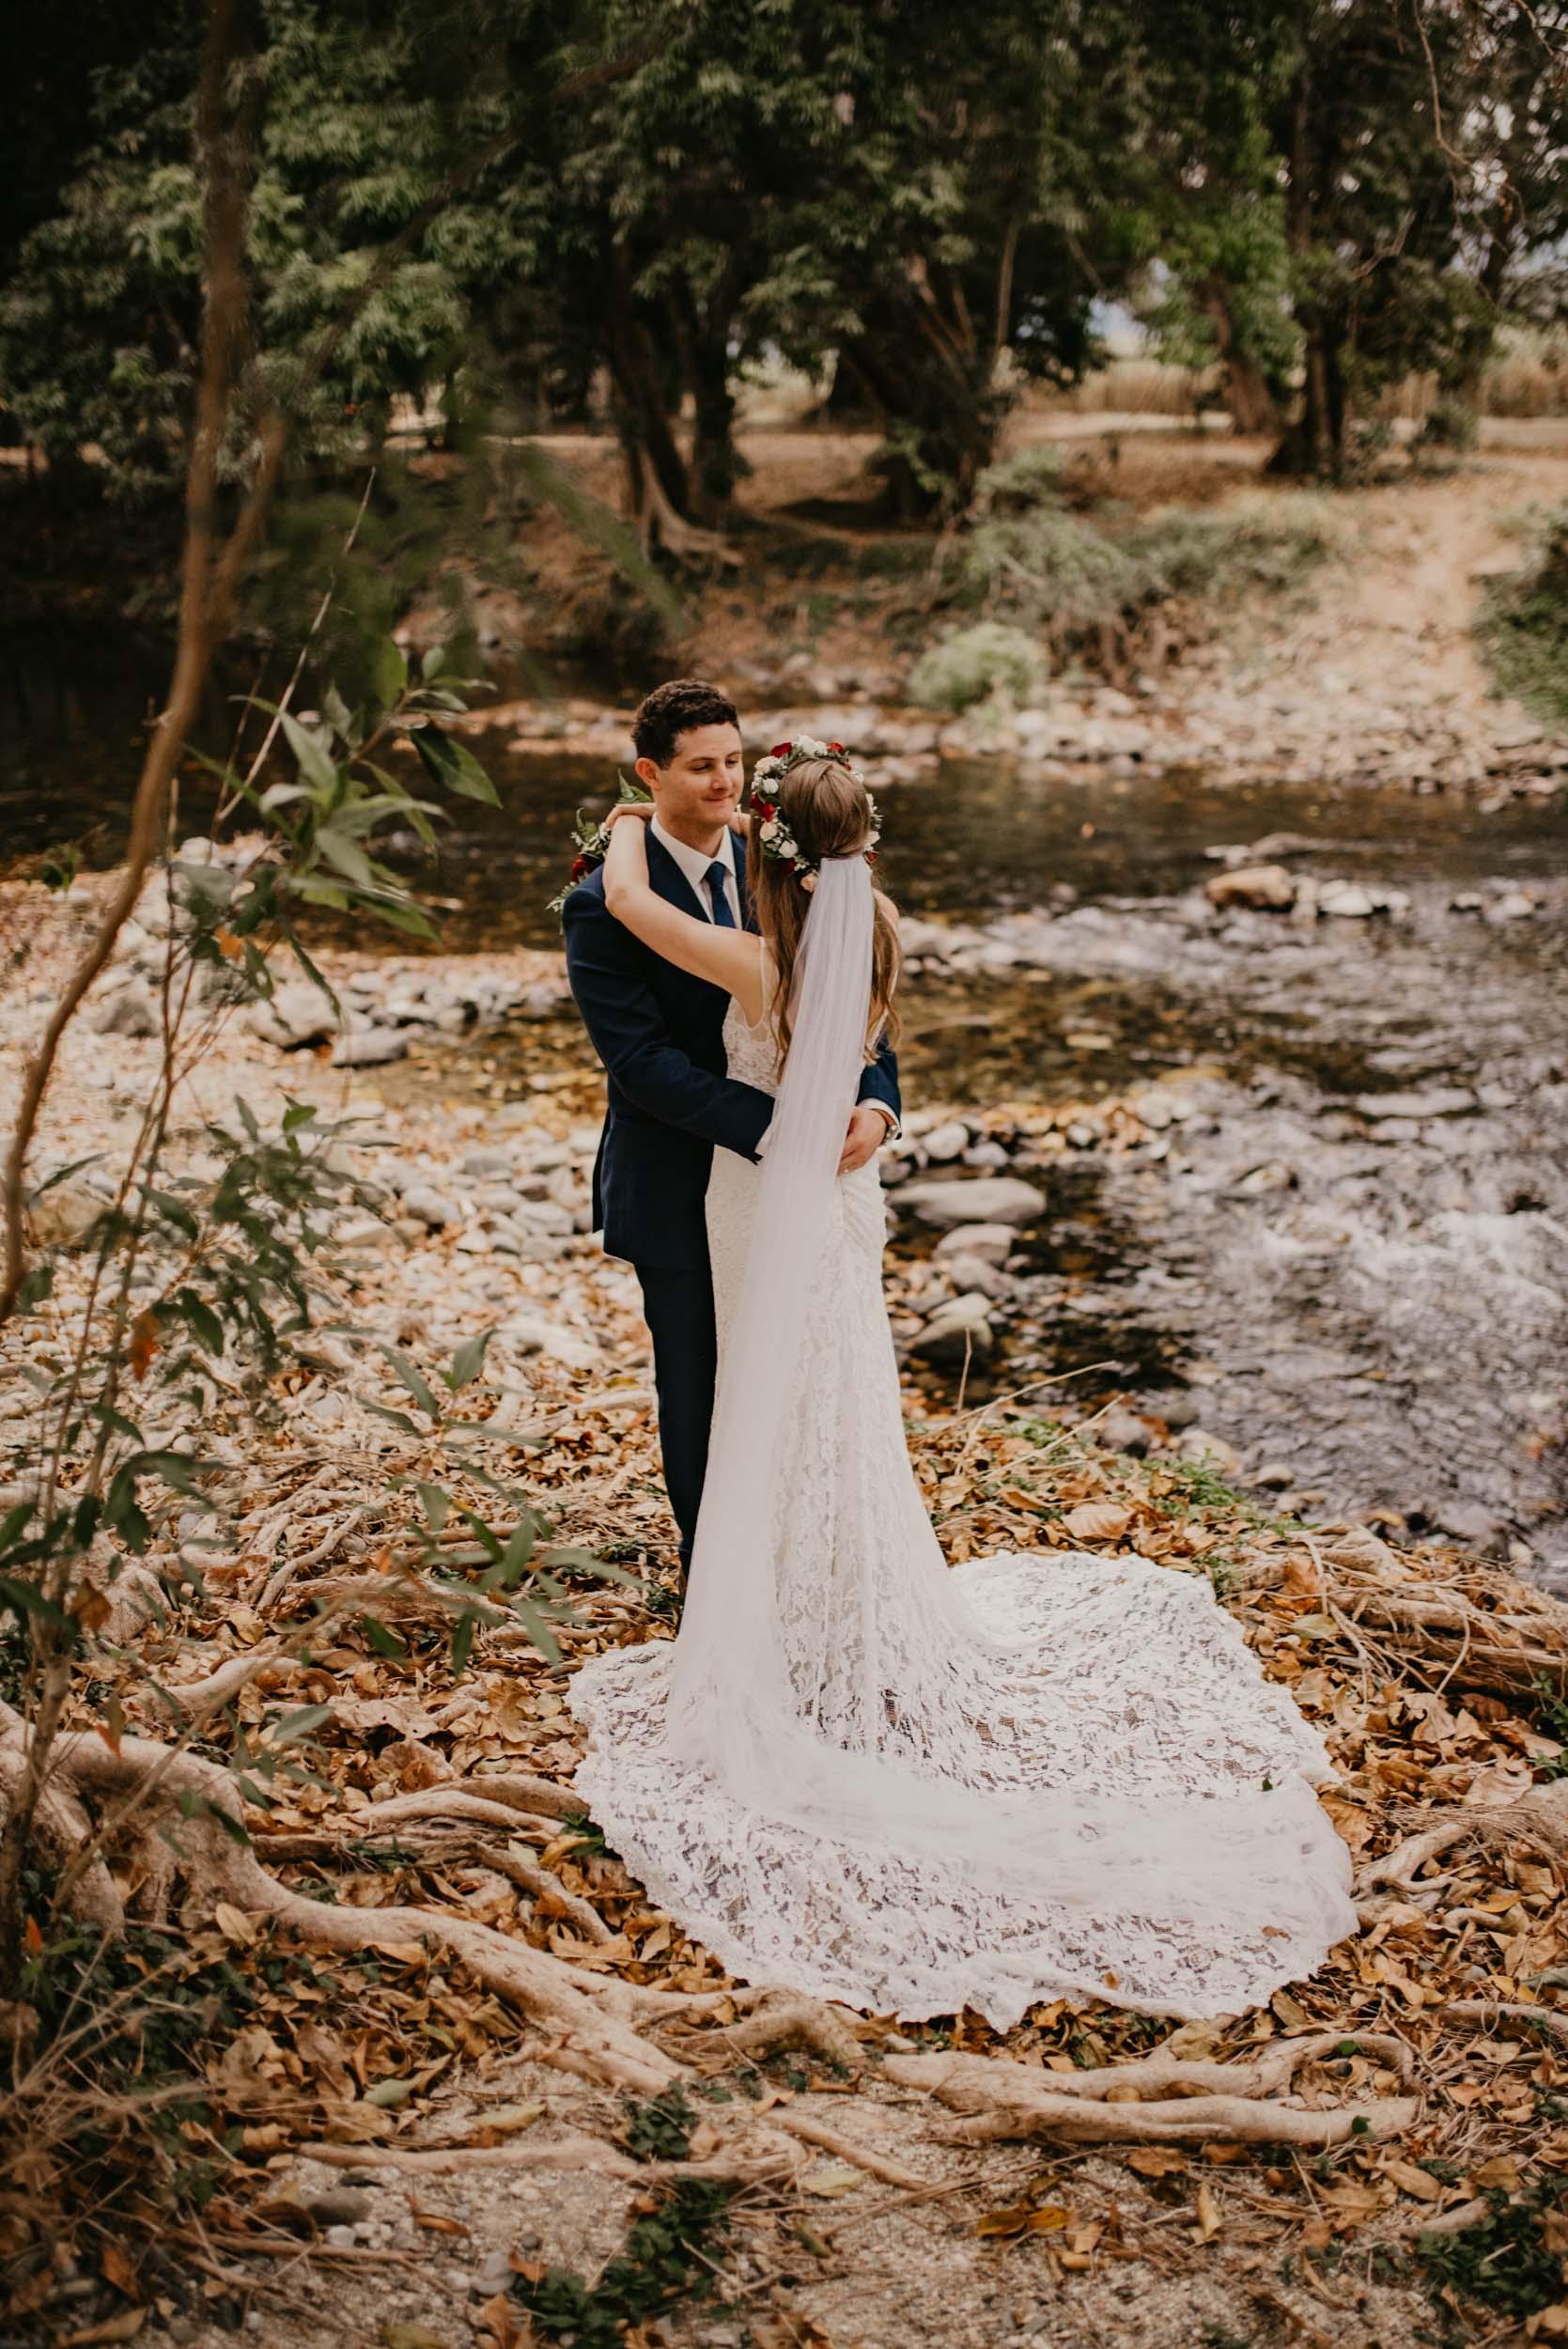 The Raw Photographer - Cairns Wedding Photographer - Laloli - Cairns Garden Ceremony - Cane Fields Photo Shoot-49.jpg